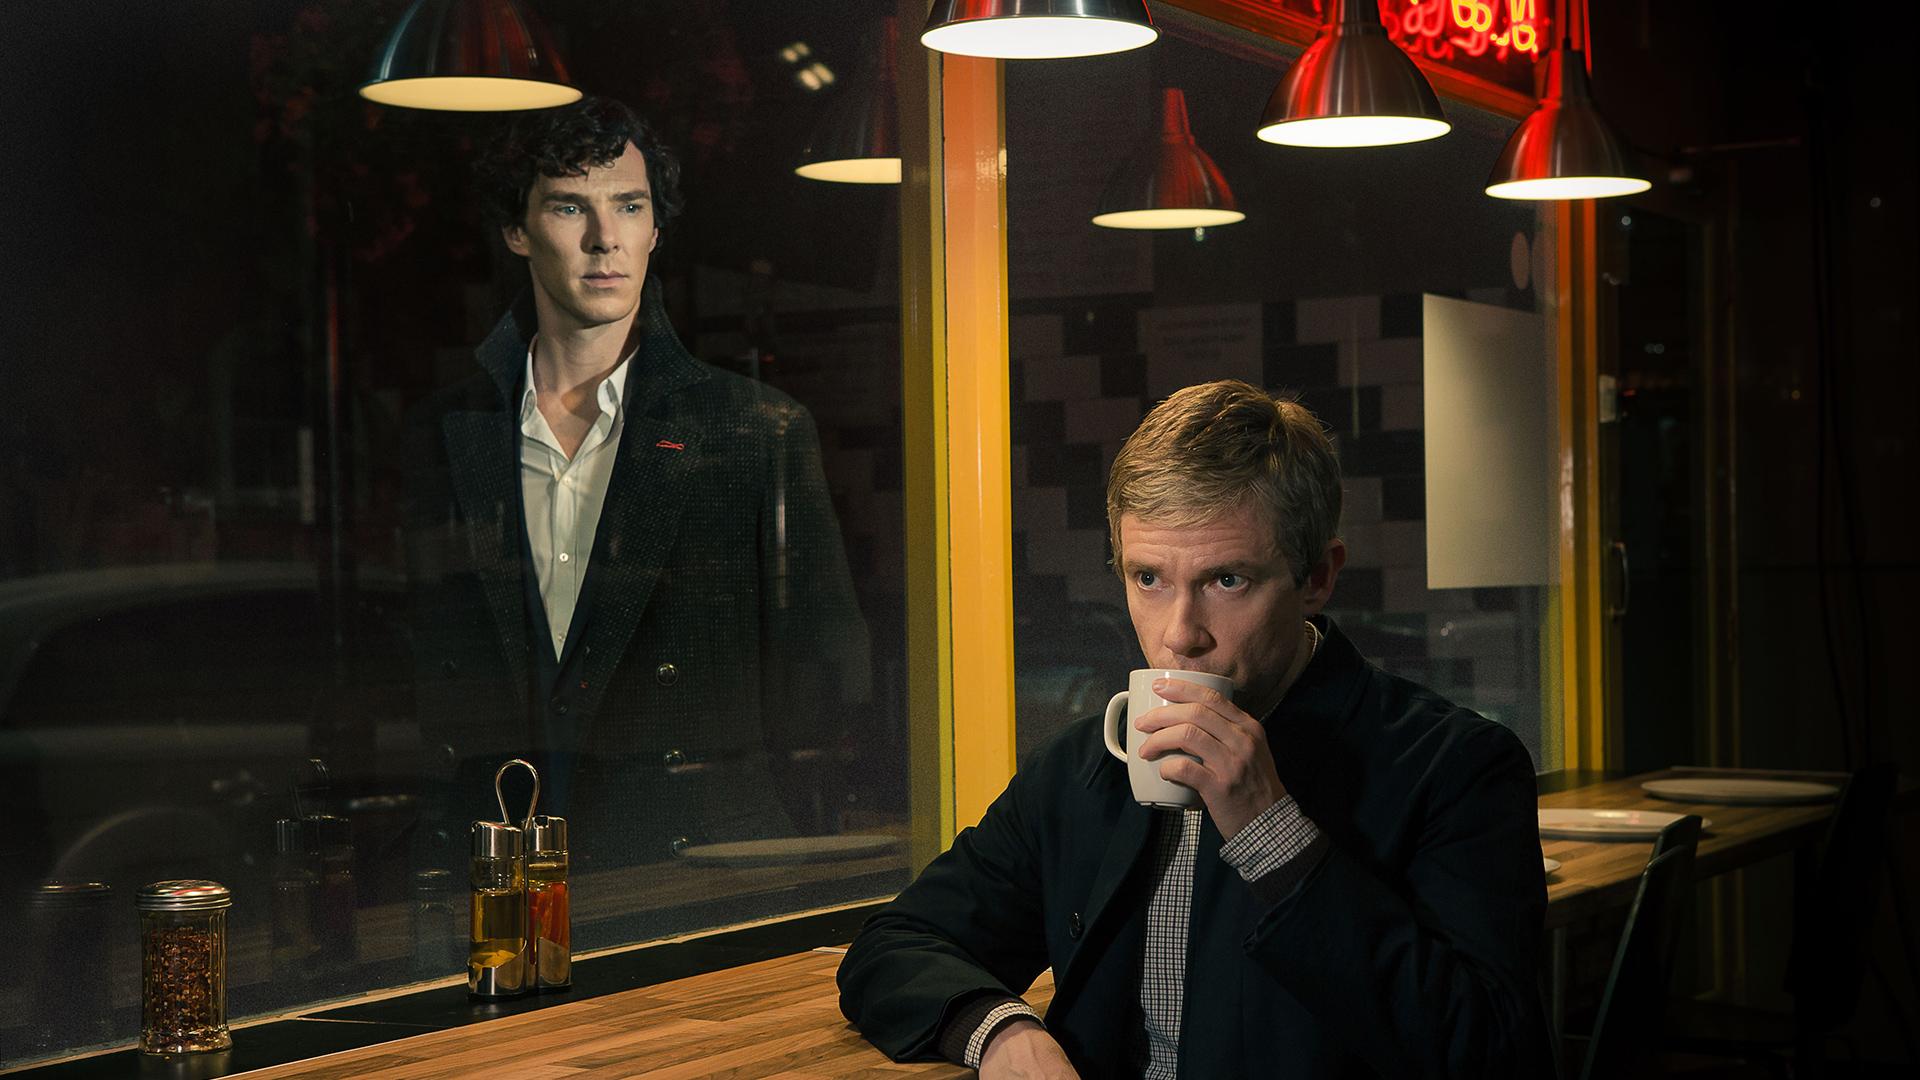 Sherlock Full HD Fondo De Pantalla And Fondo De Escritorio